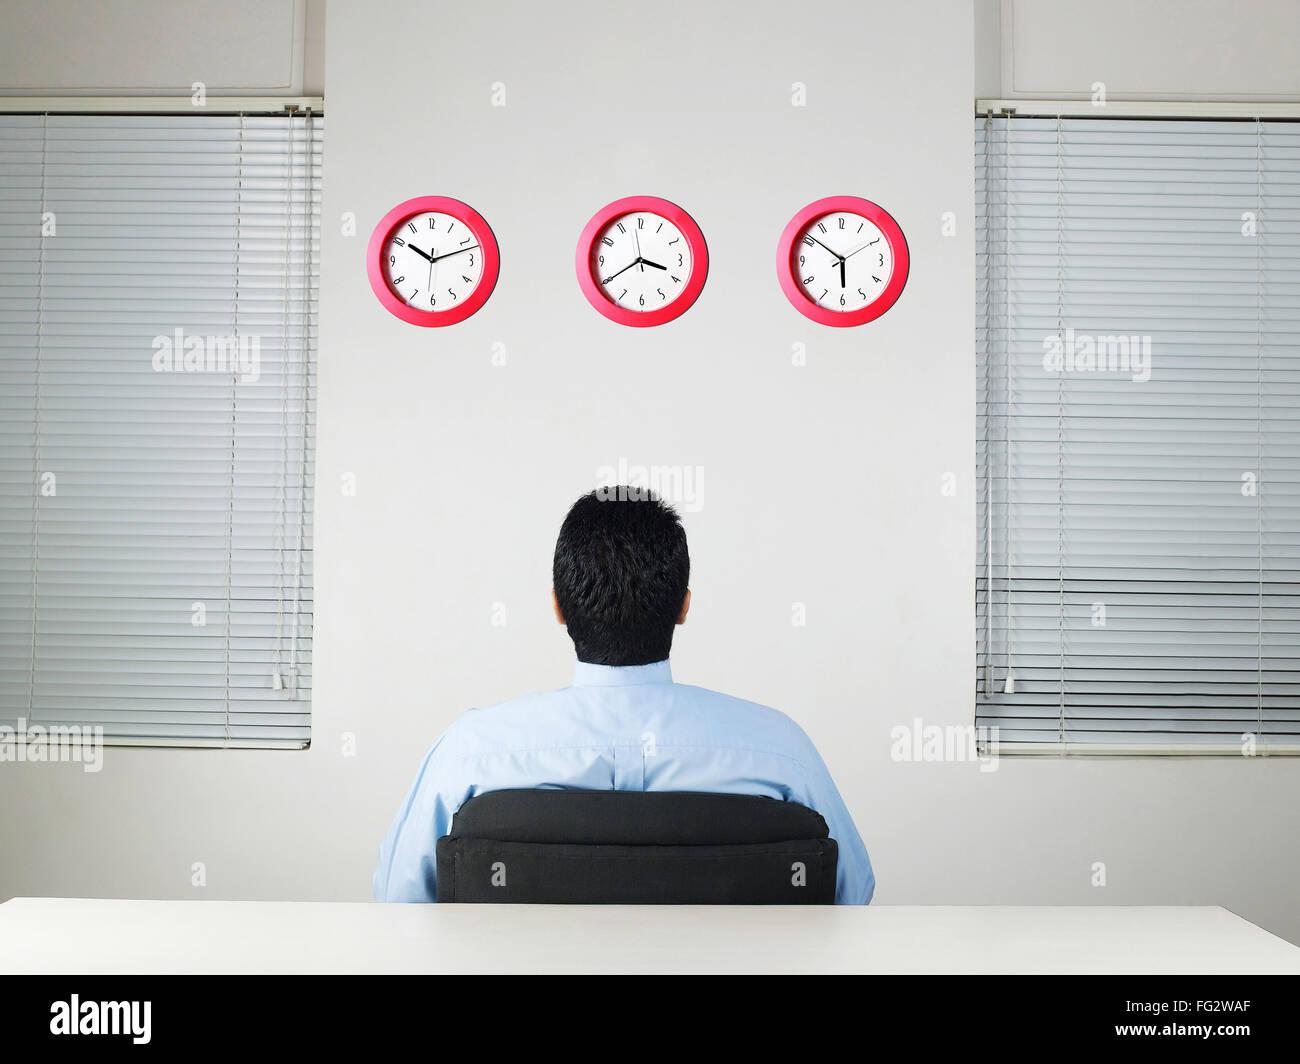 Executive looking at row of clocks MR #779K - Stock Image